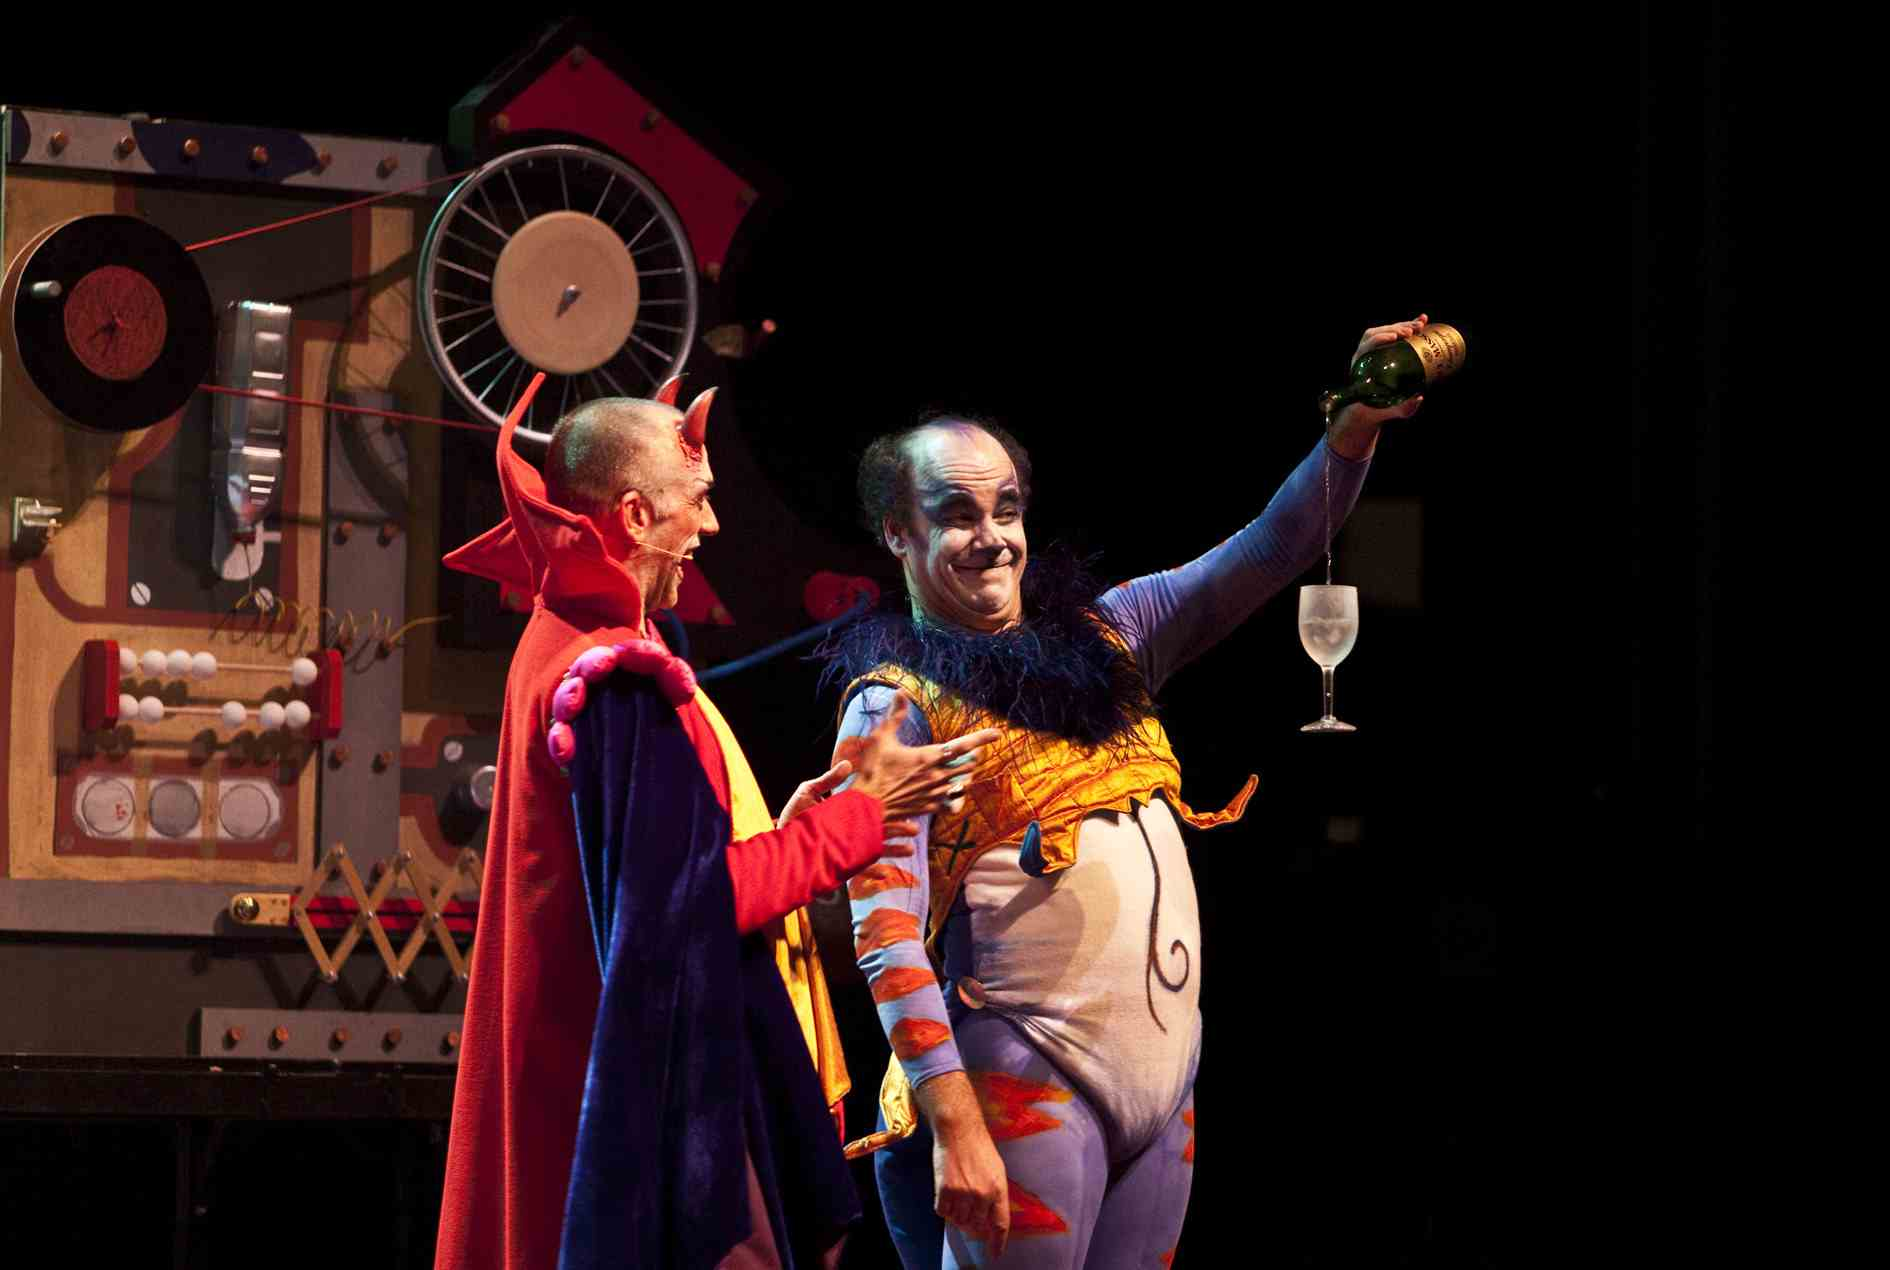 Los diablillos de la ópera